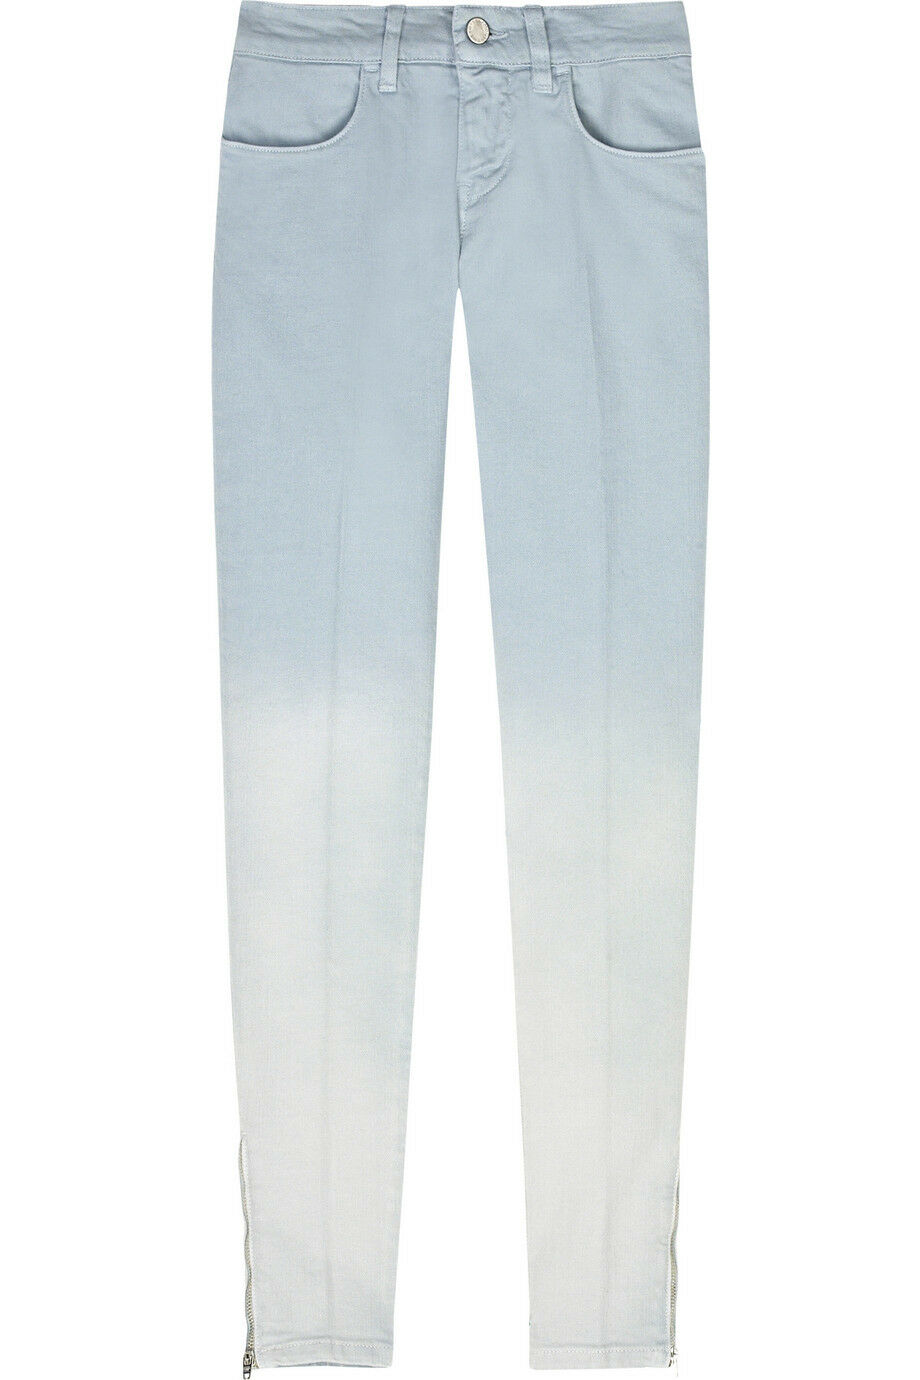 Stella mccartney skinny ombre dip-dye degrade denim jeans 27